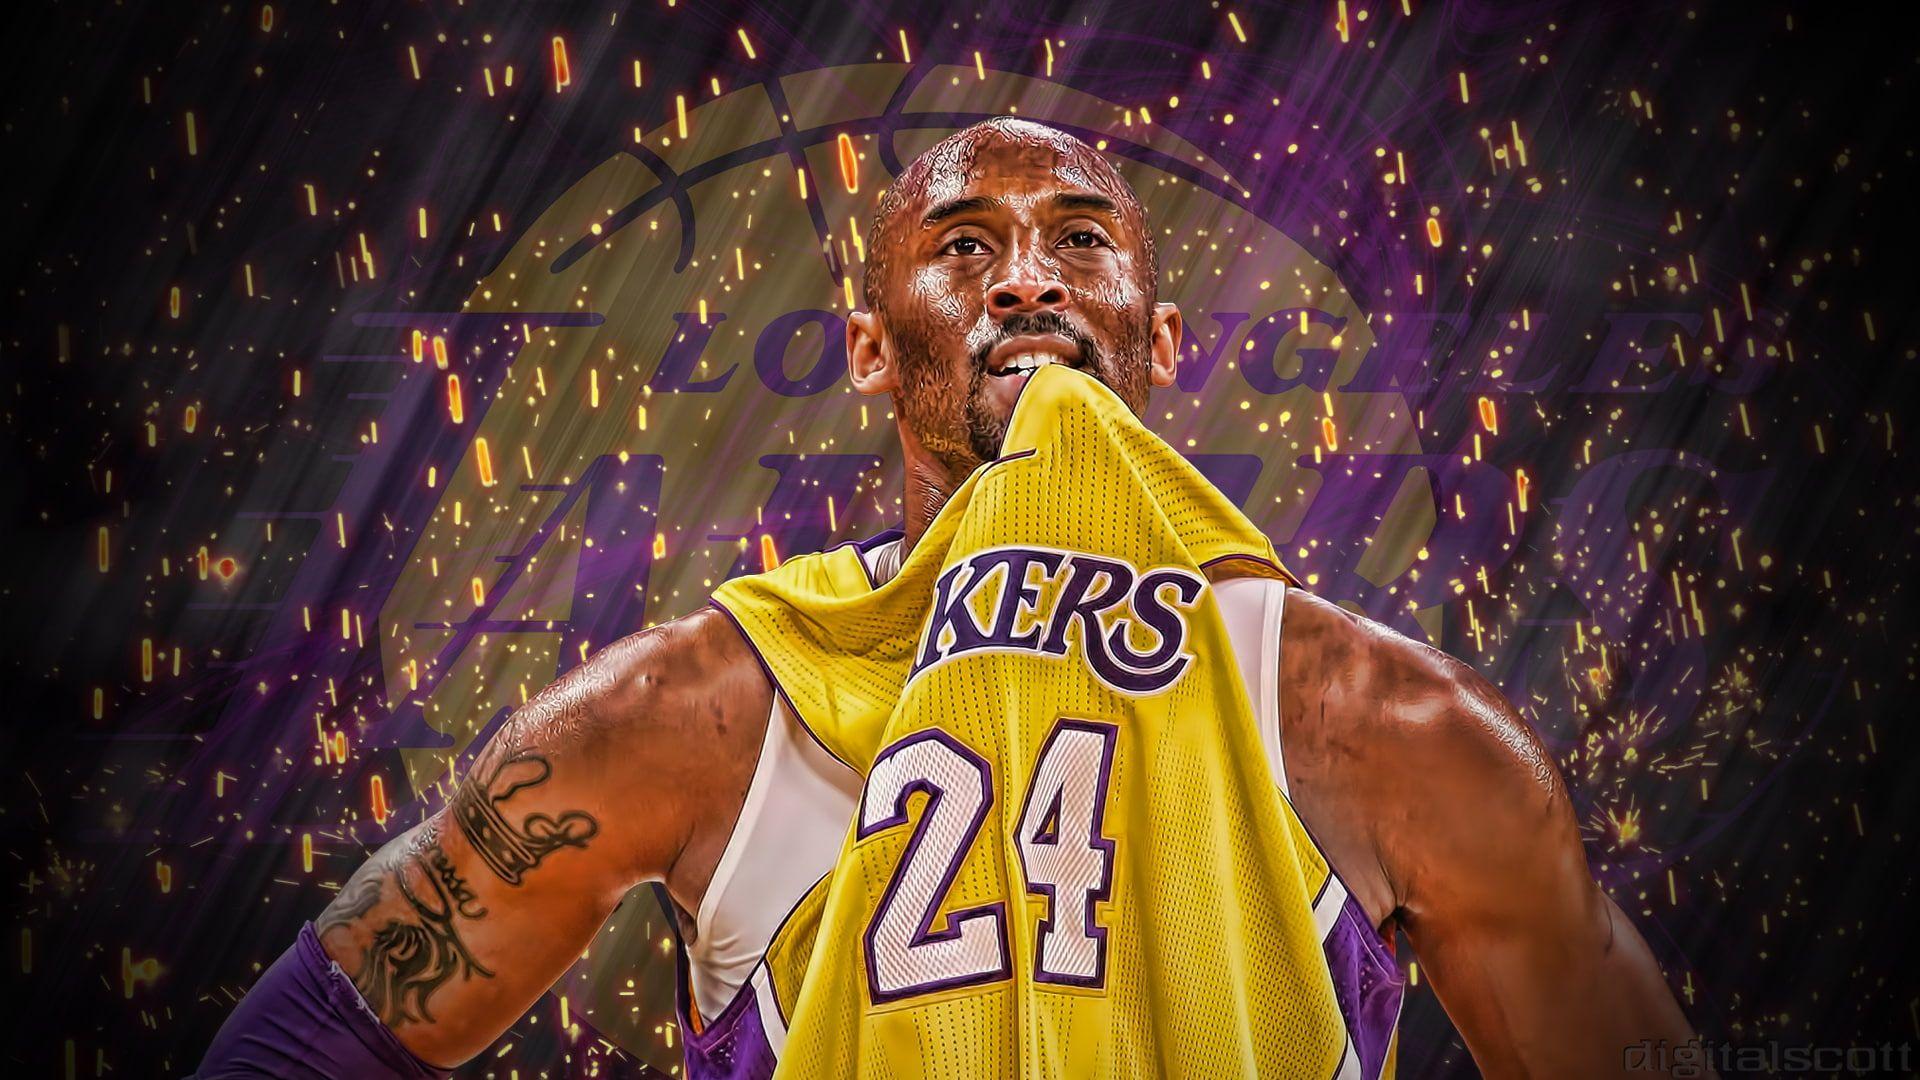 Kobe Bryant Computer 1080p Wallpaper Hdwallpaper Desktop In 2020 Kobe Bryant Wallpaper Kobe Bryant Kobe